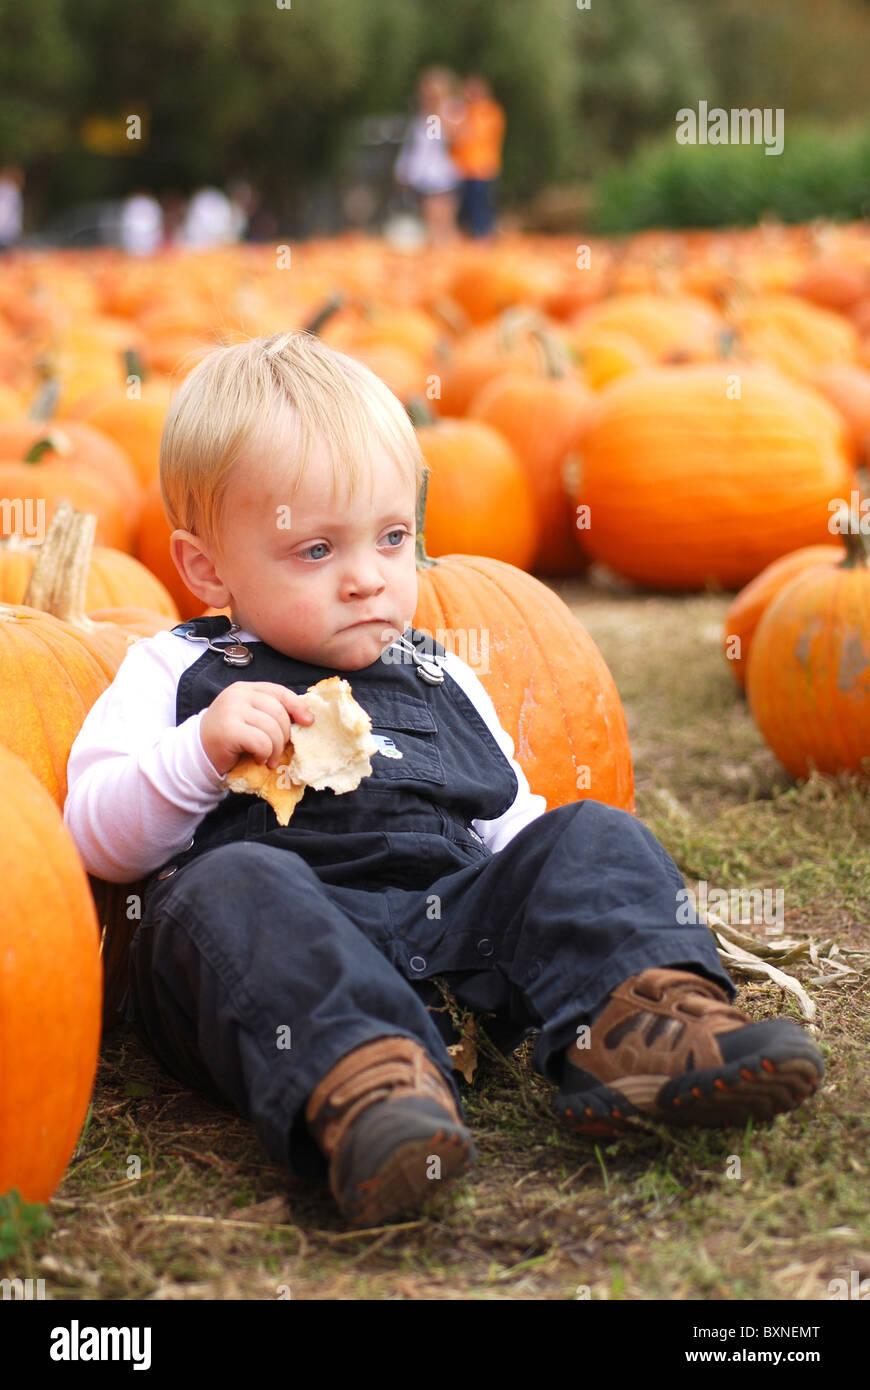 Young boy at a pumpkin farm Stock Photo